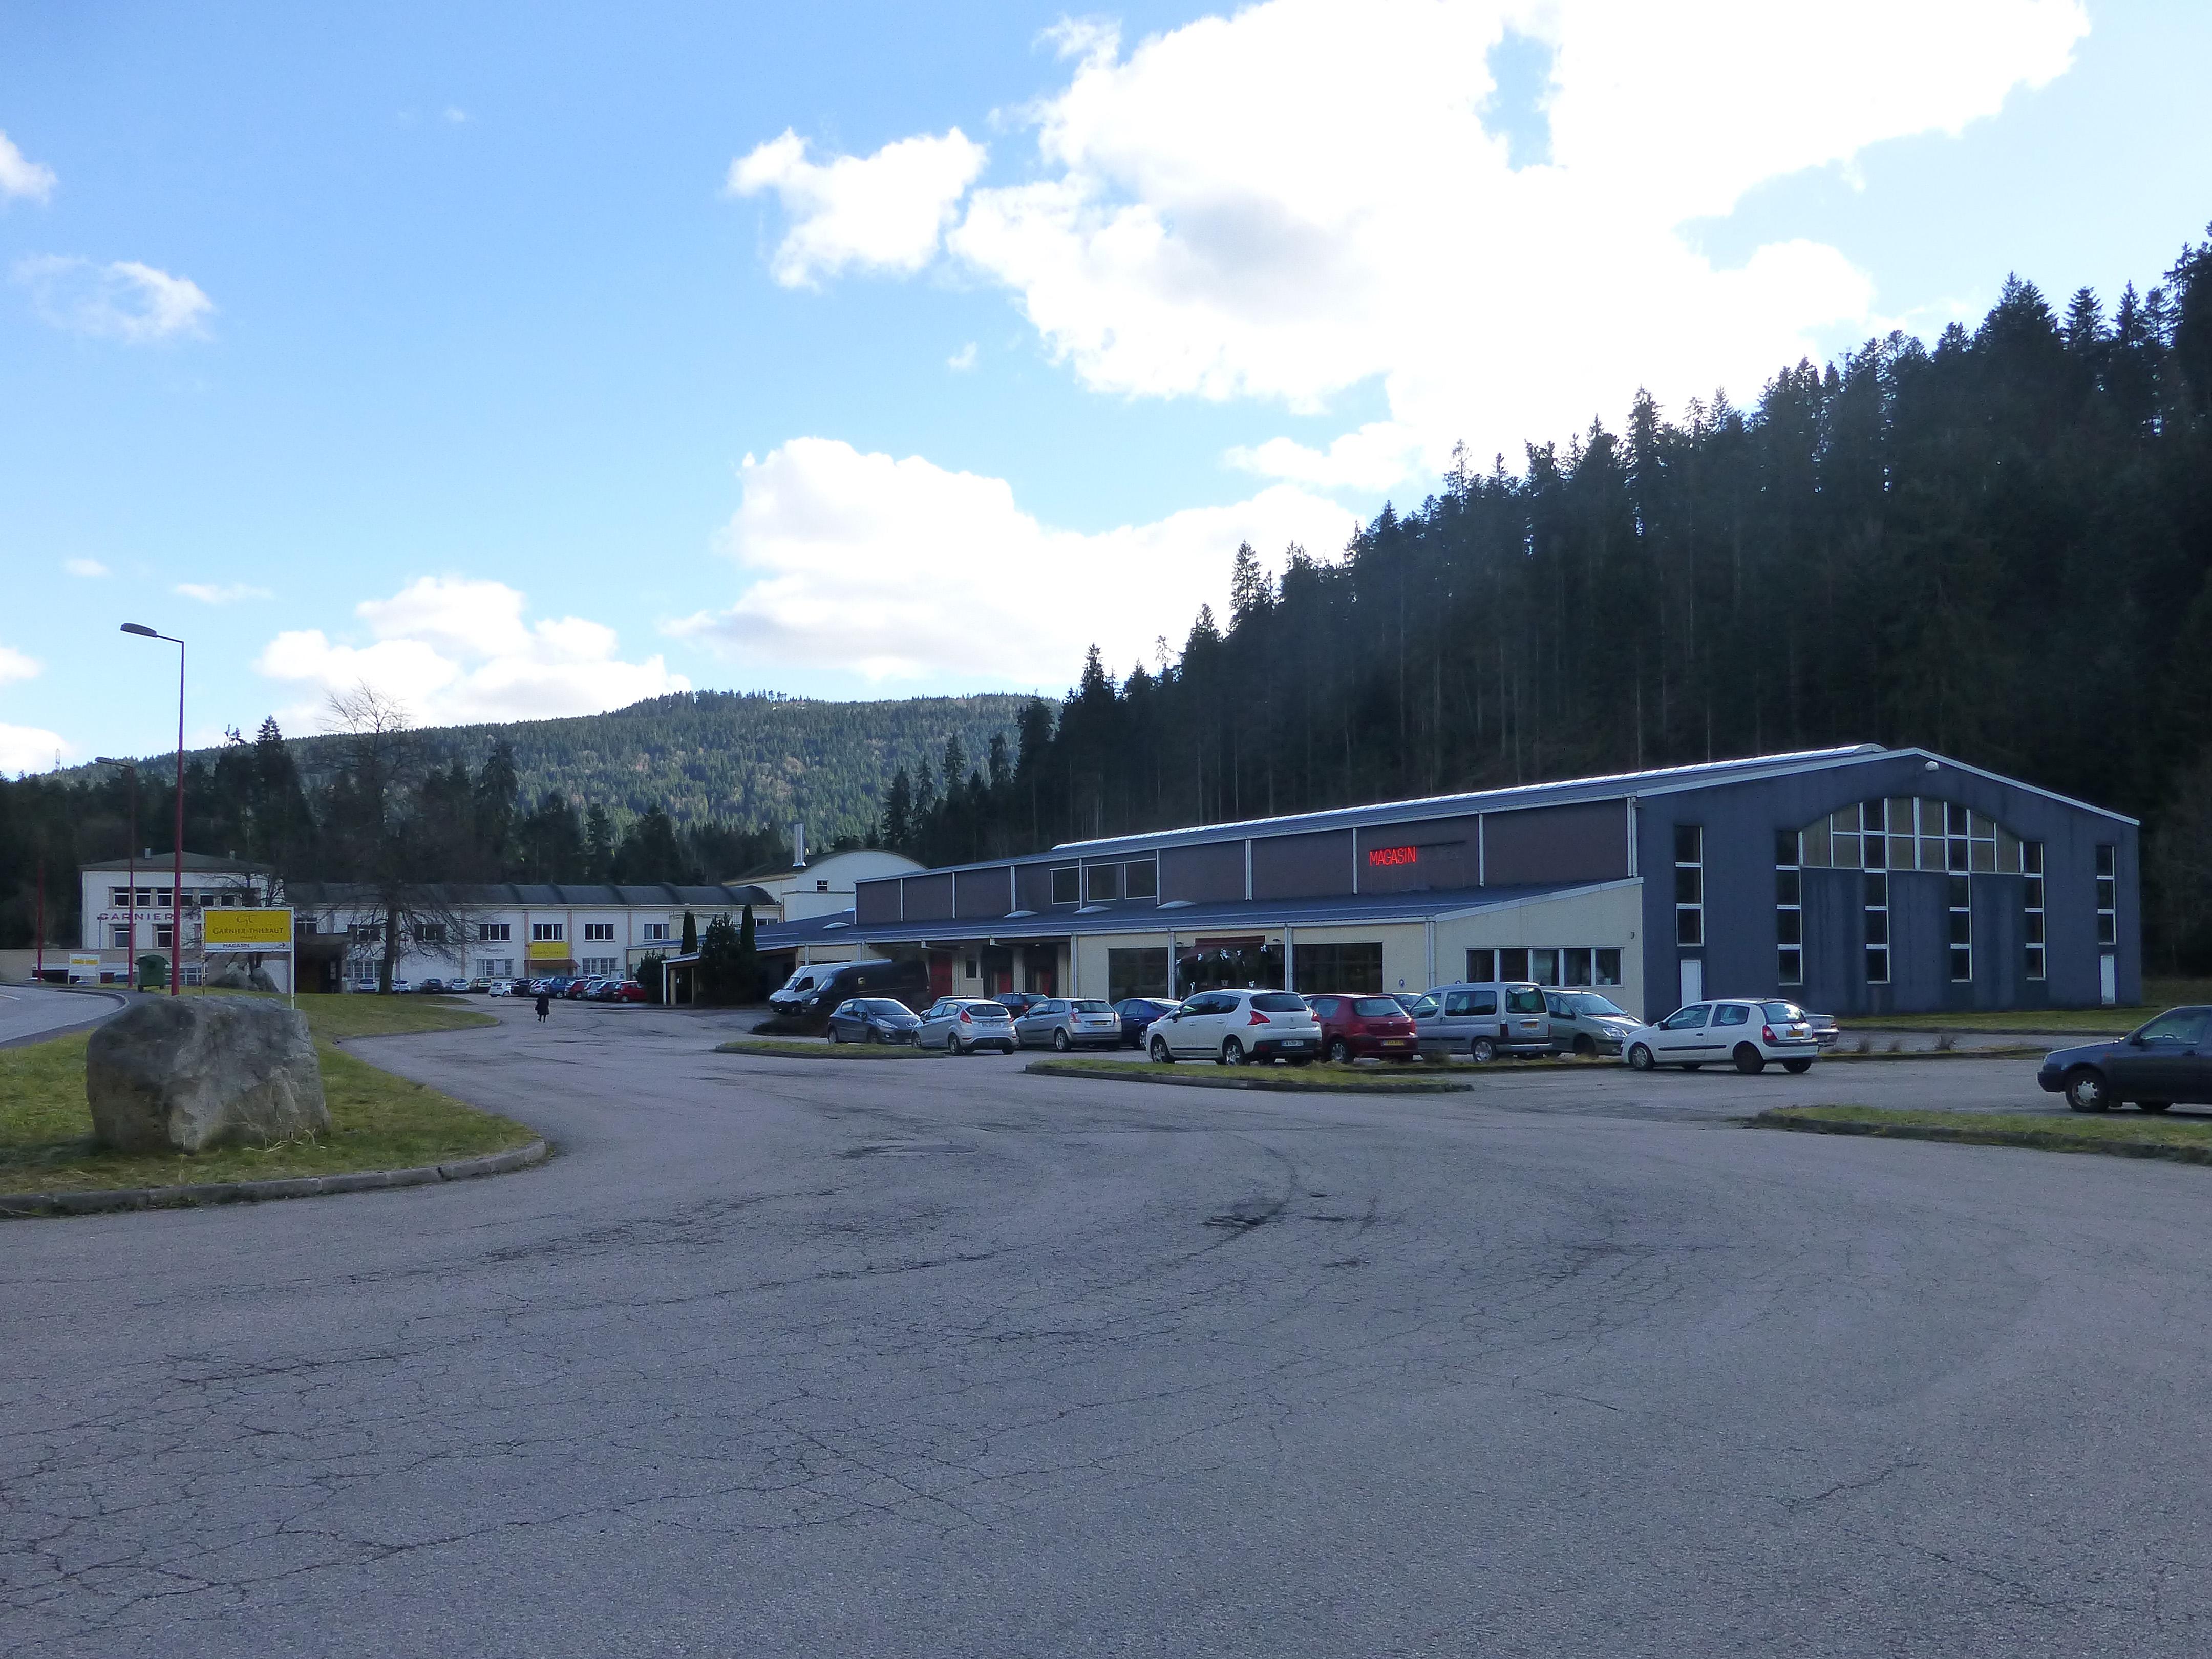 File kichompr usine et magasin garnier thi baut 2 jpg wikimedia commons - Garnier thiebaut magasin usine ...